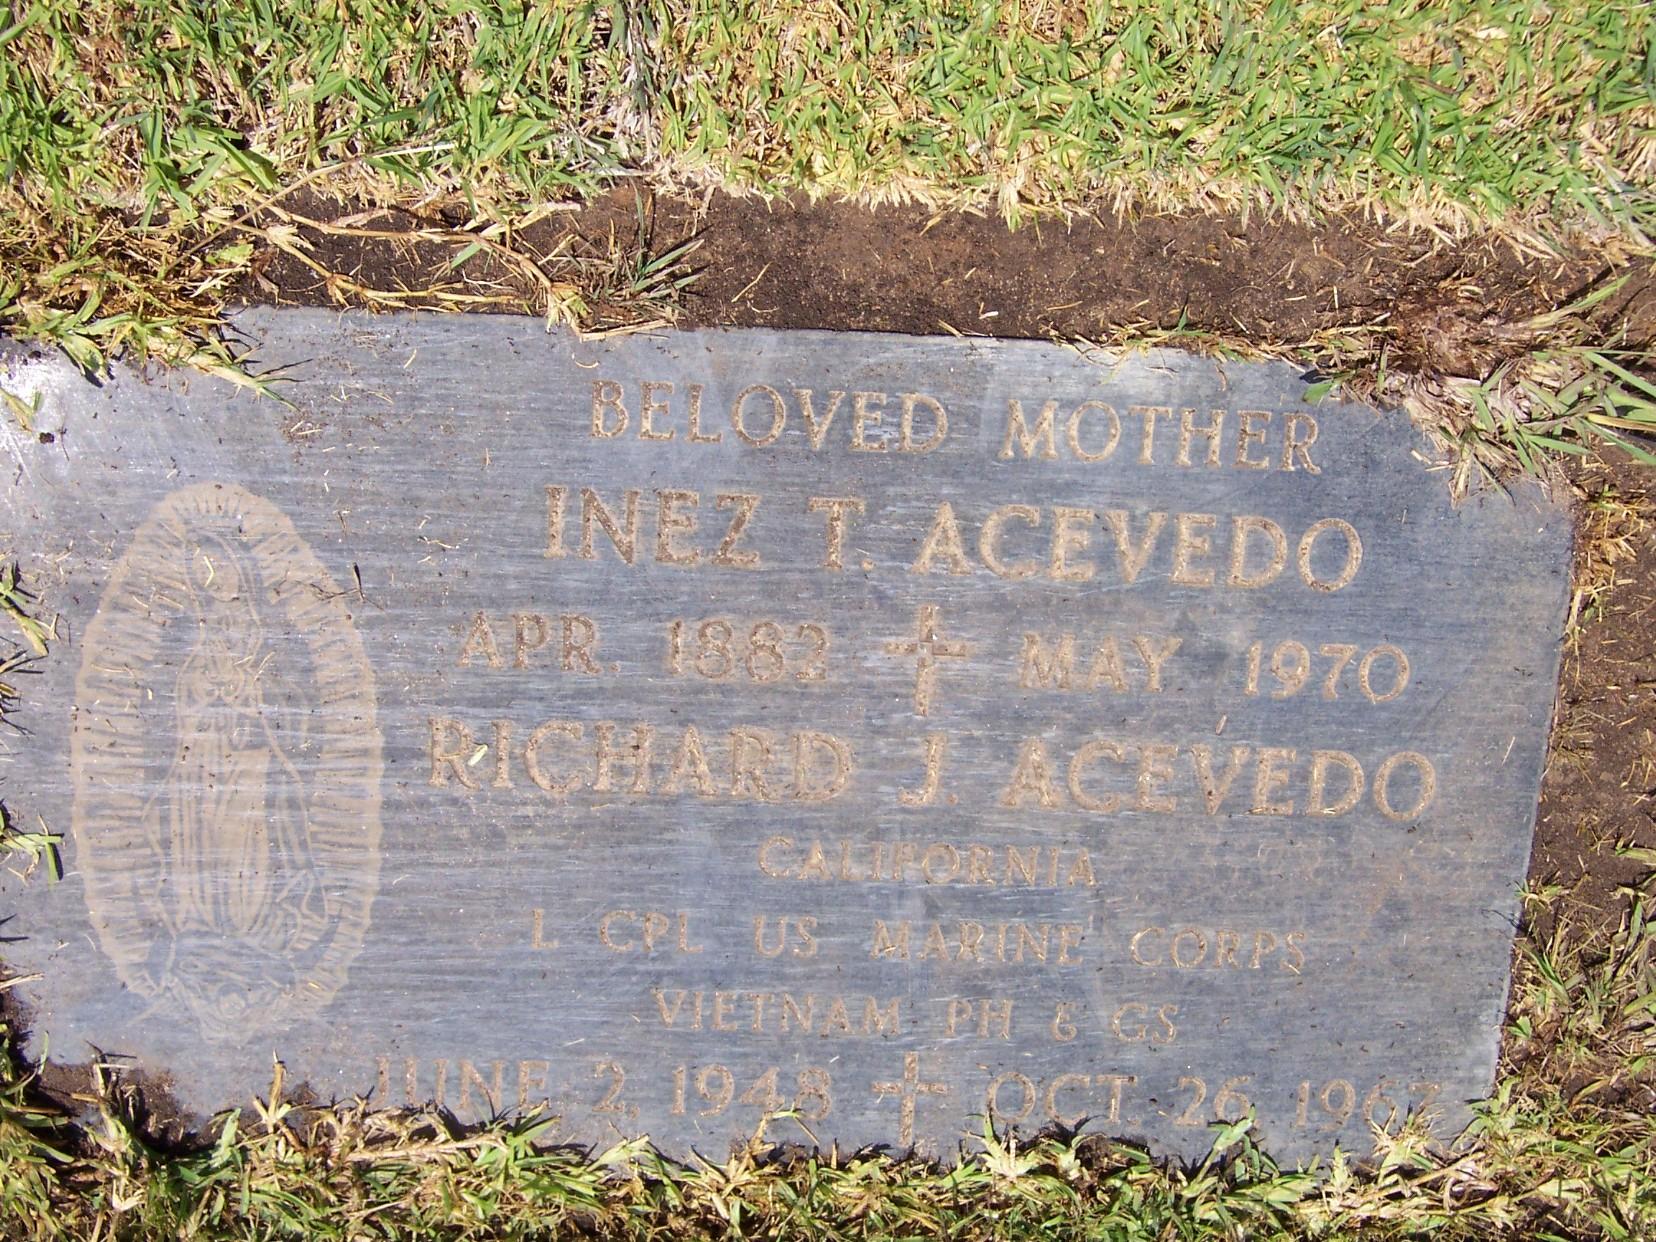 LCpl Richard Joseph Ace Acevedo